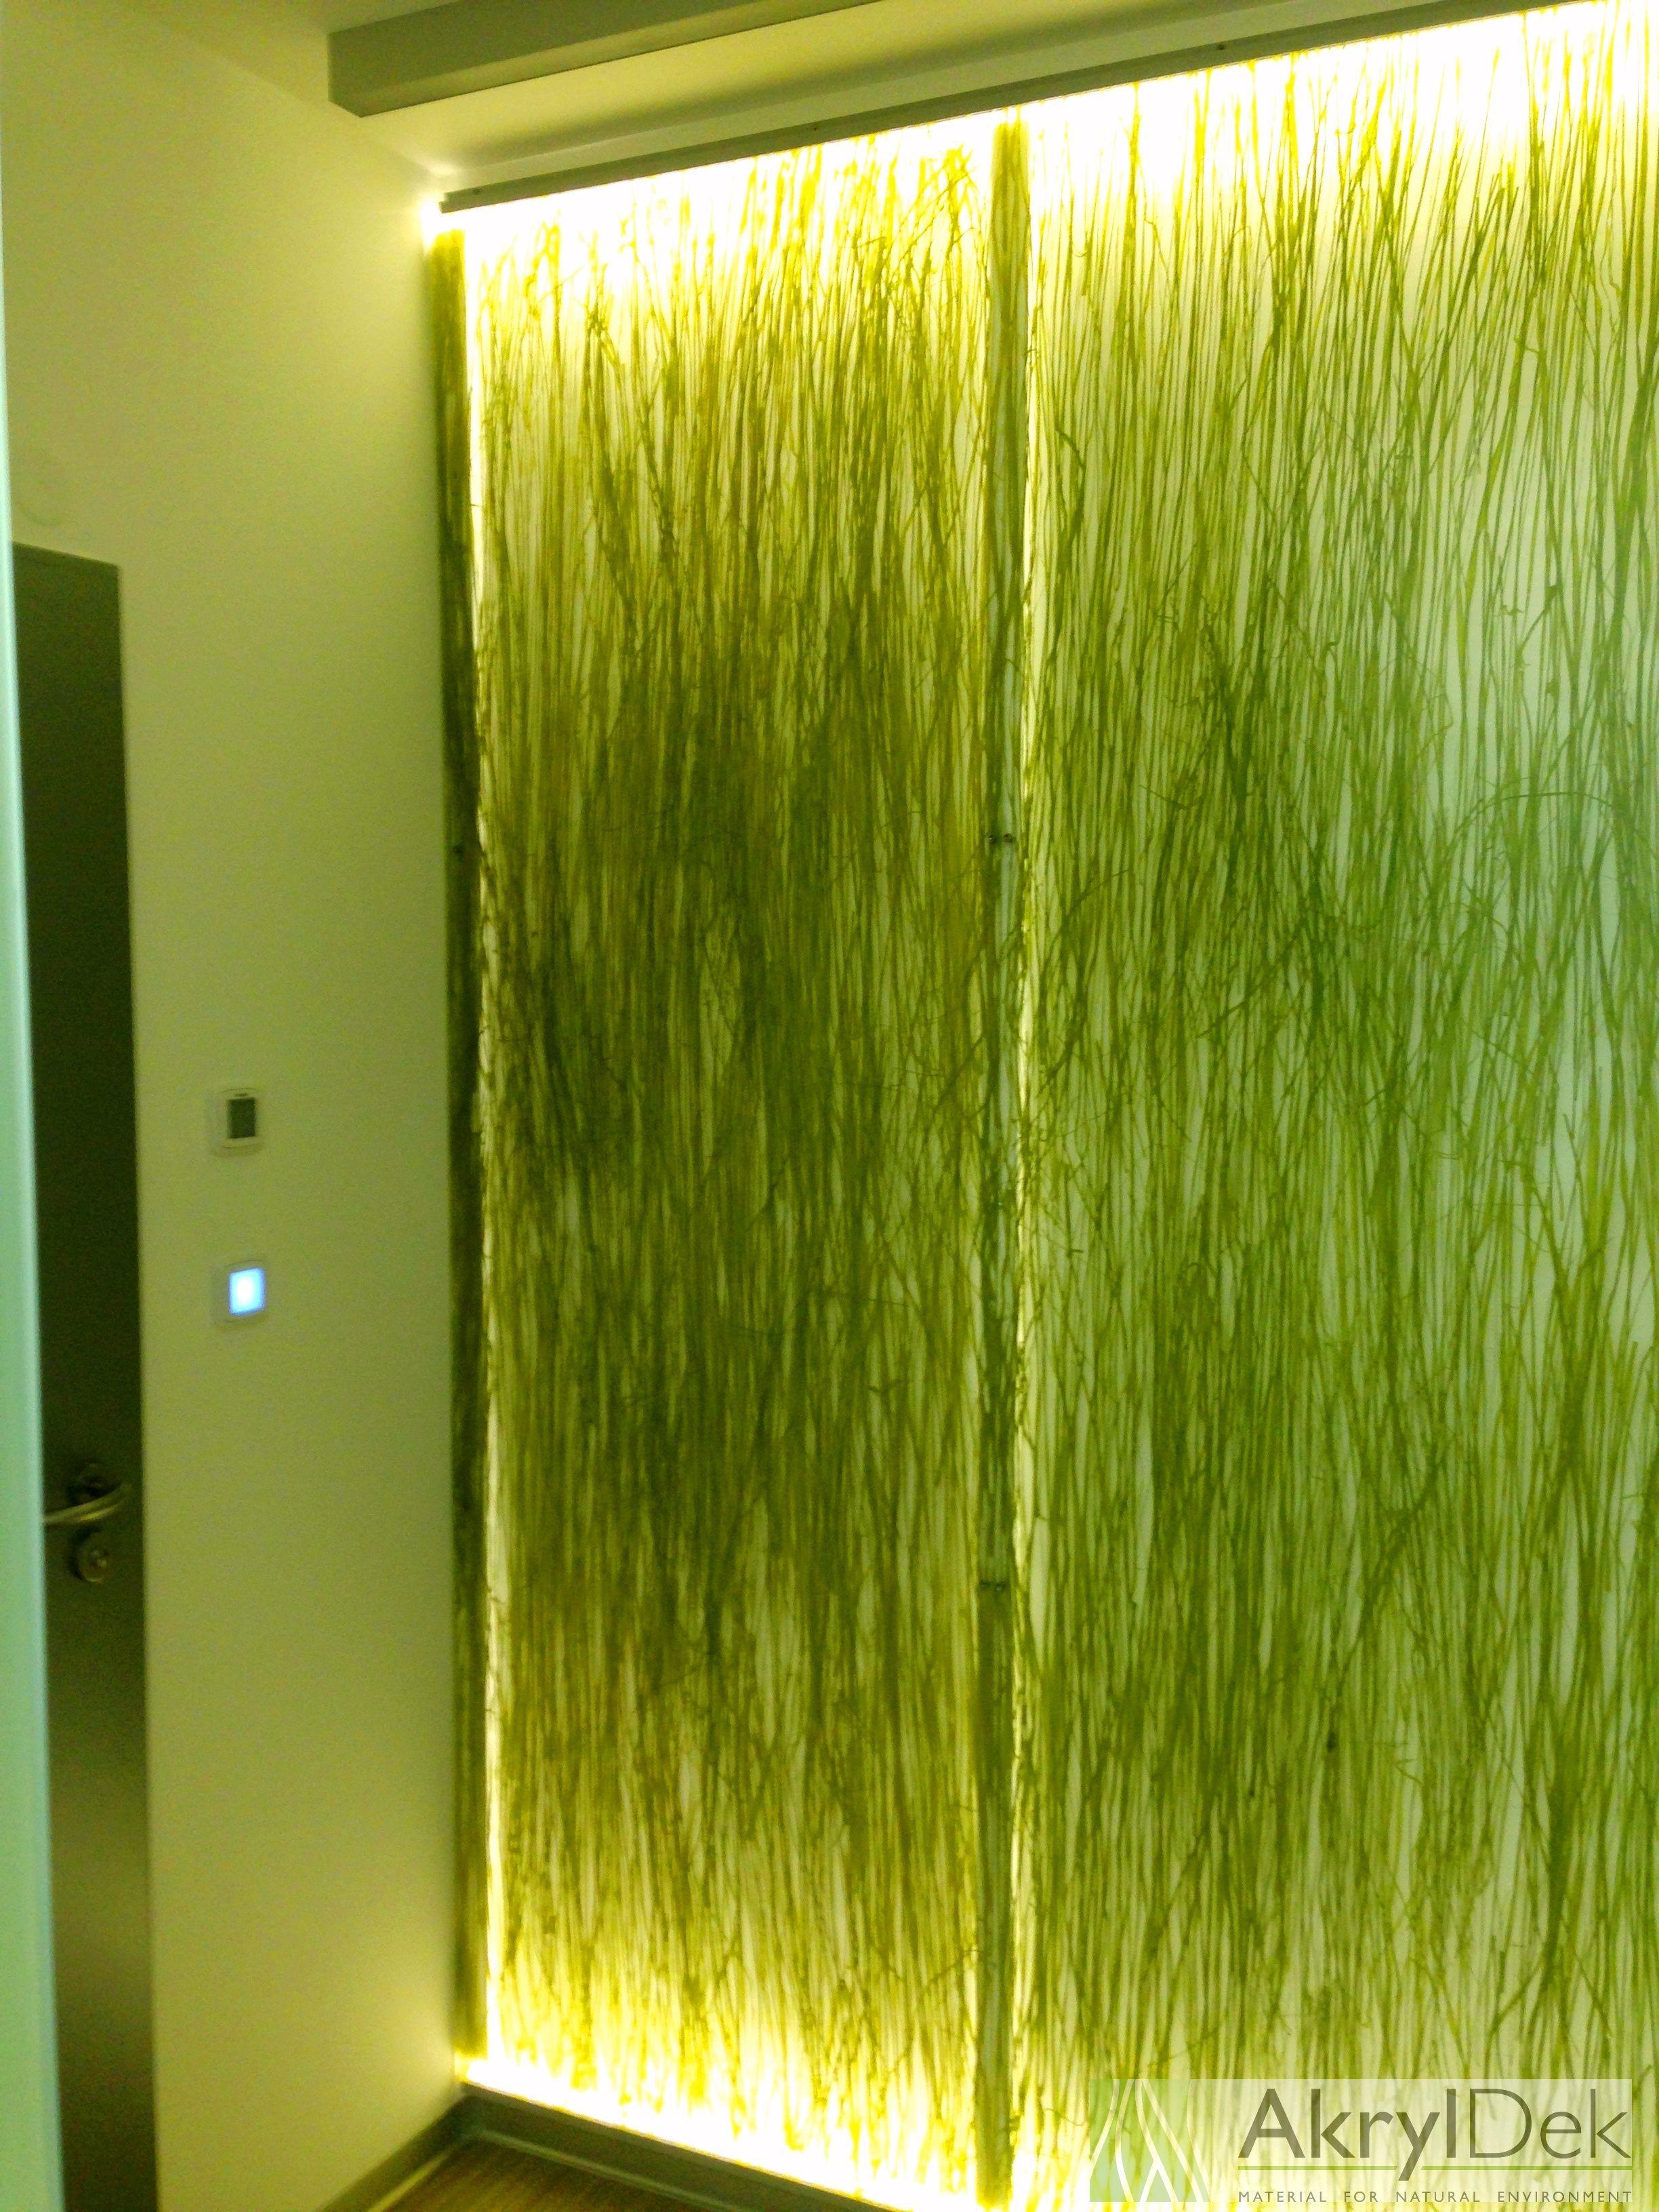 Wall Panel Decoration With Organic Grass And Backlight Decorative Translucent Wallpanels Decoration Resin Acrylic Design Idea Decor Home Decor